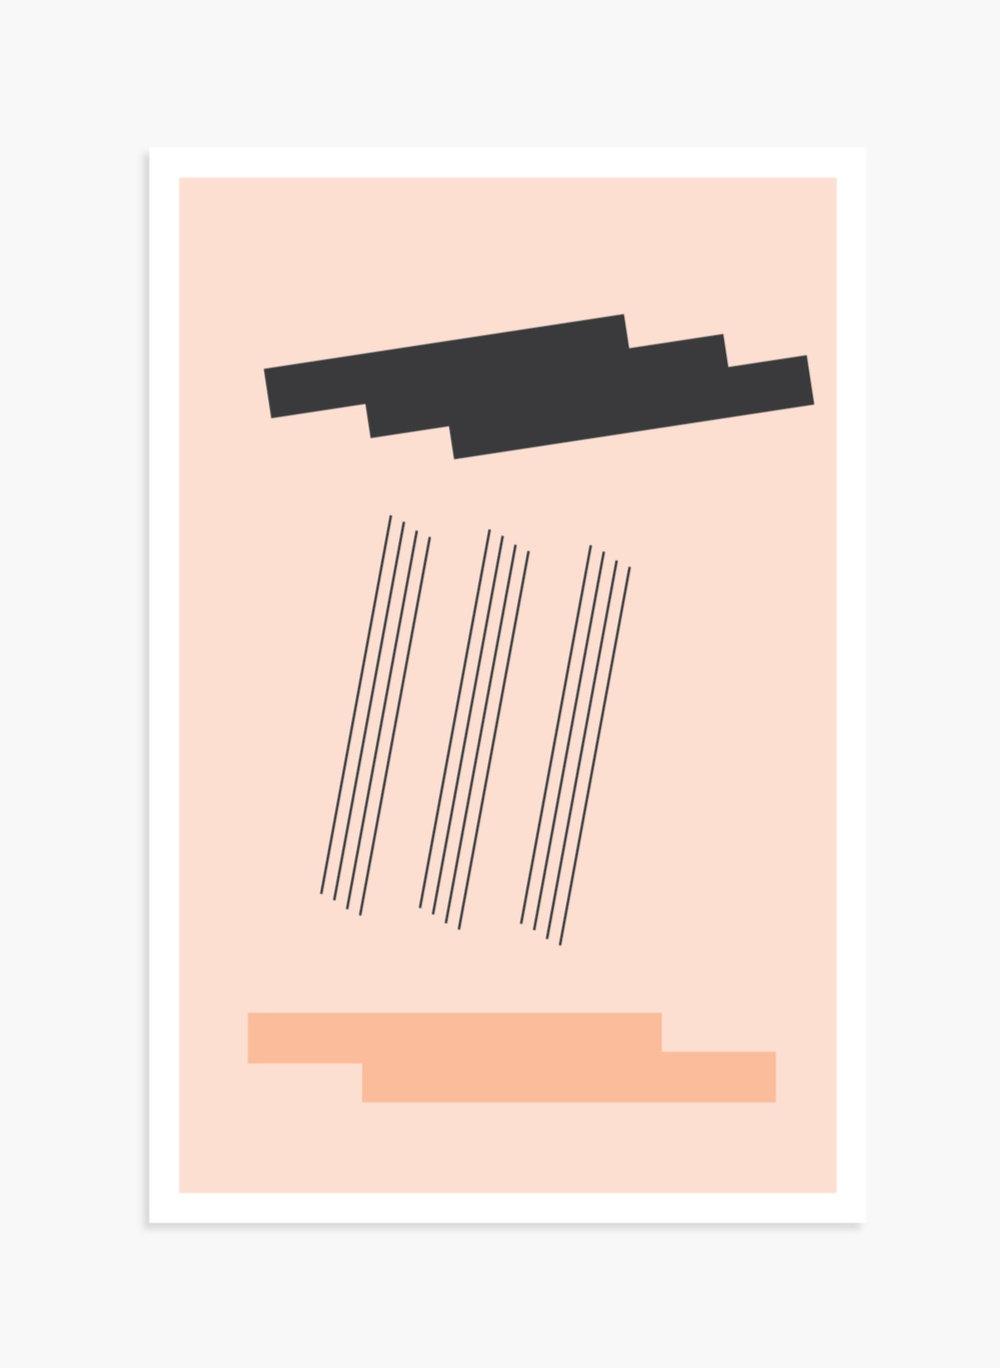 All-Turned-Around-Print-BrittanyBergamoWhalen.jpg